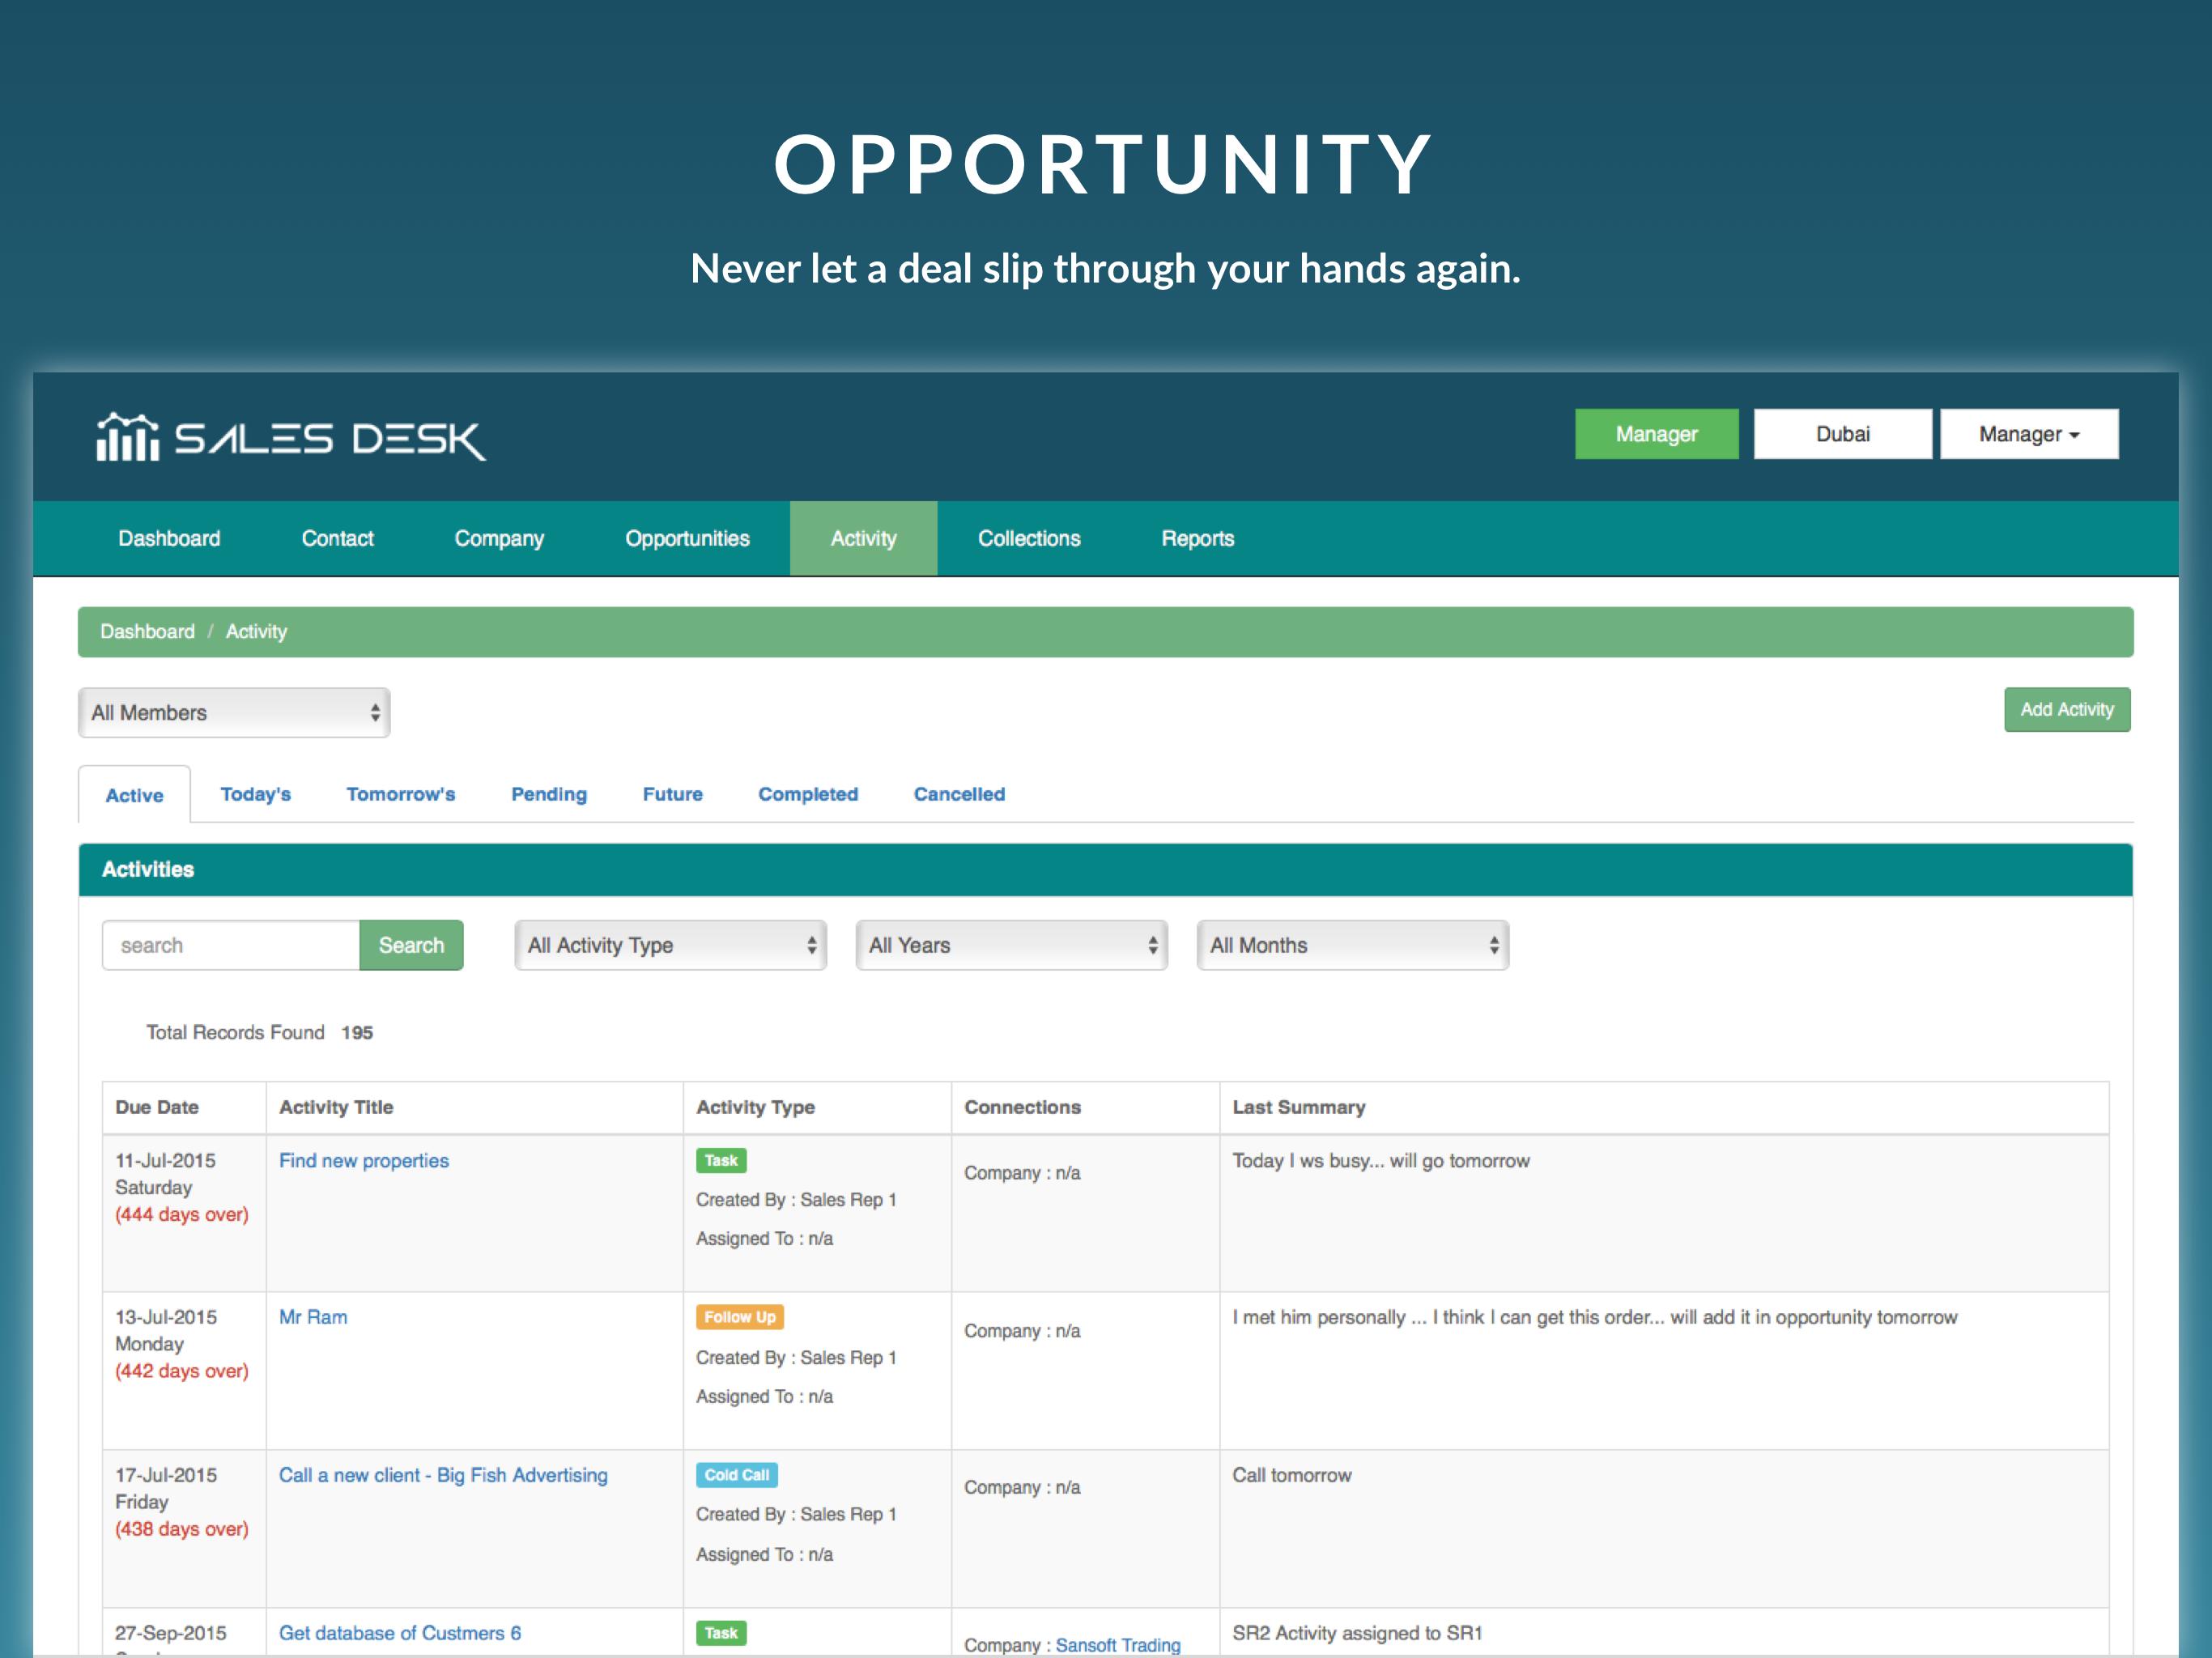 SalesDesk Demo - Opportunity